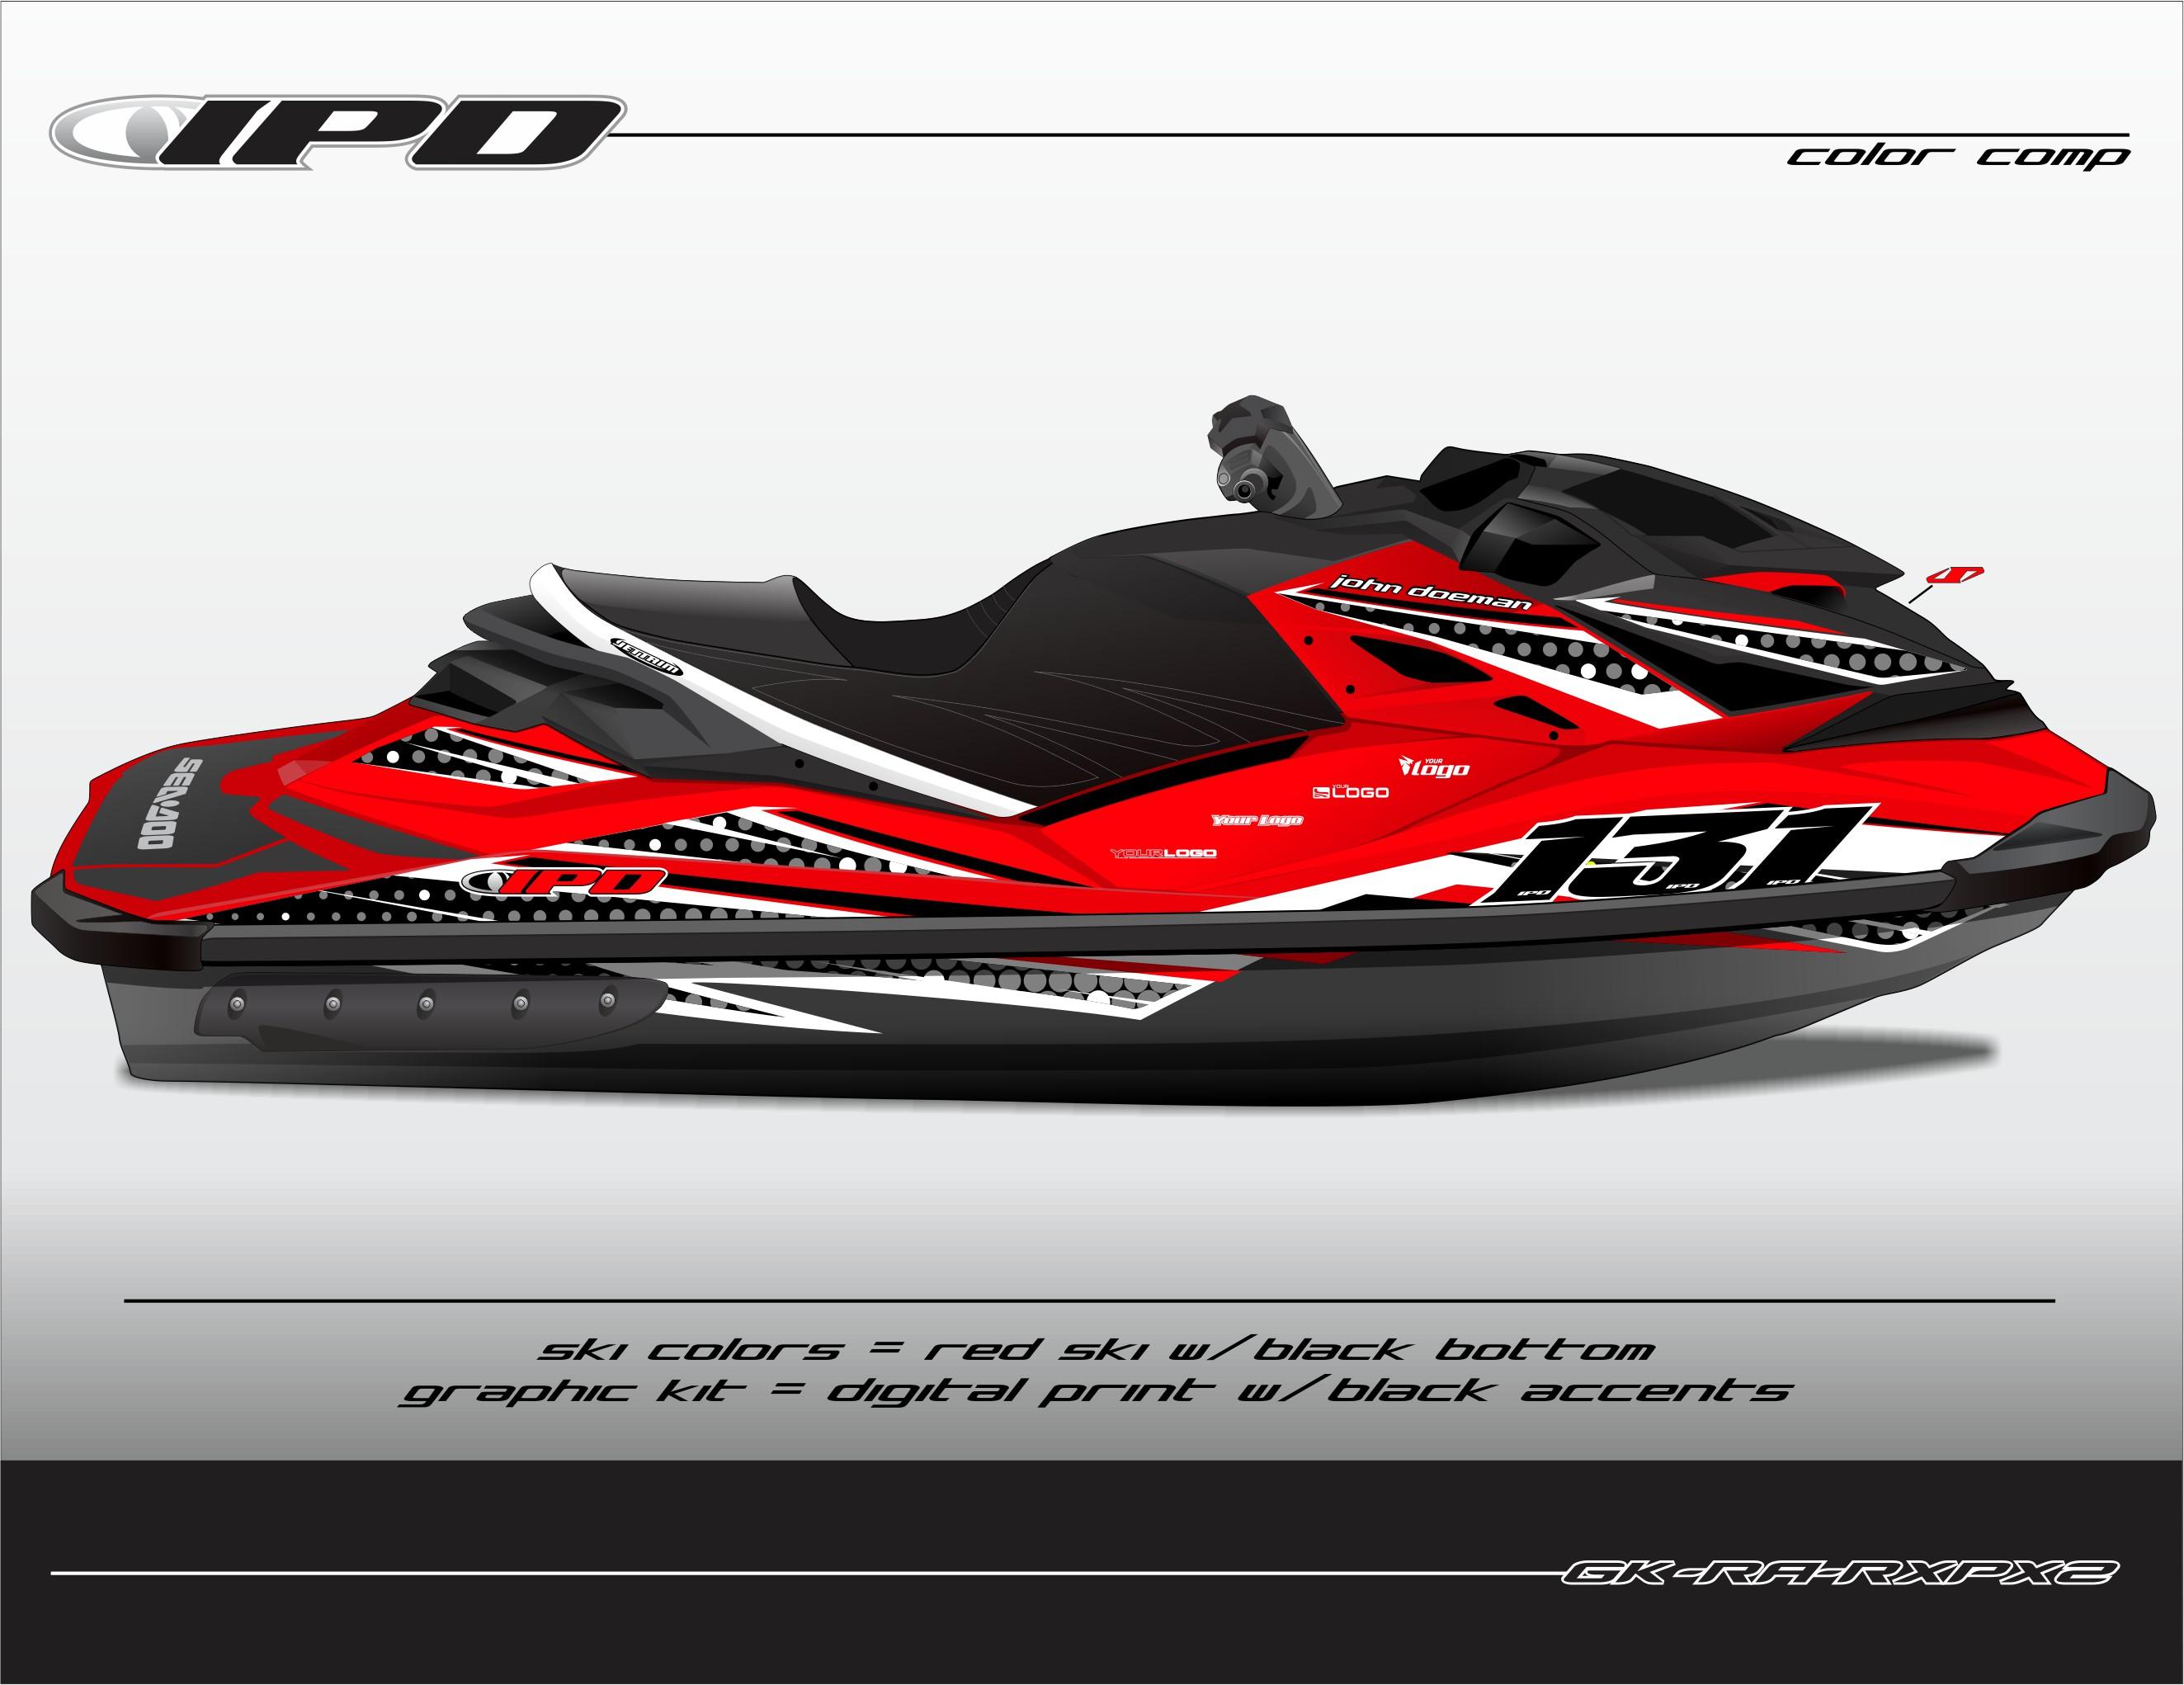 GK-RA-RXPX2 (Black Accents on Red Ski, Black Bottom)